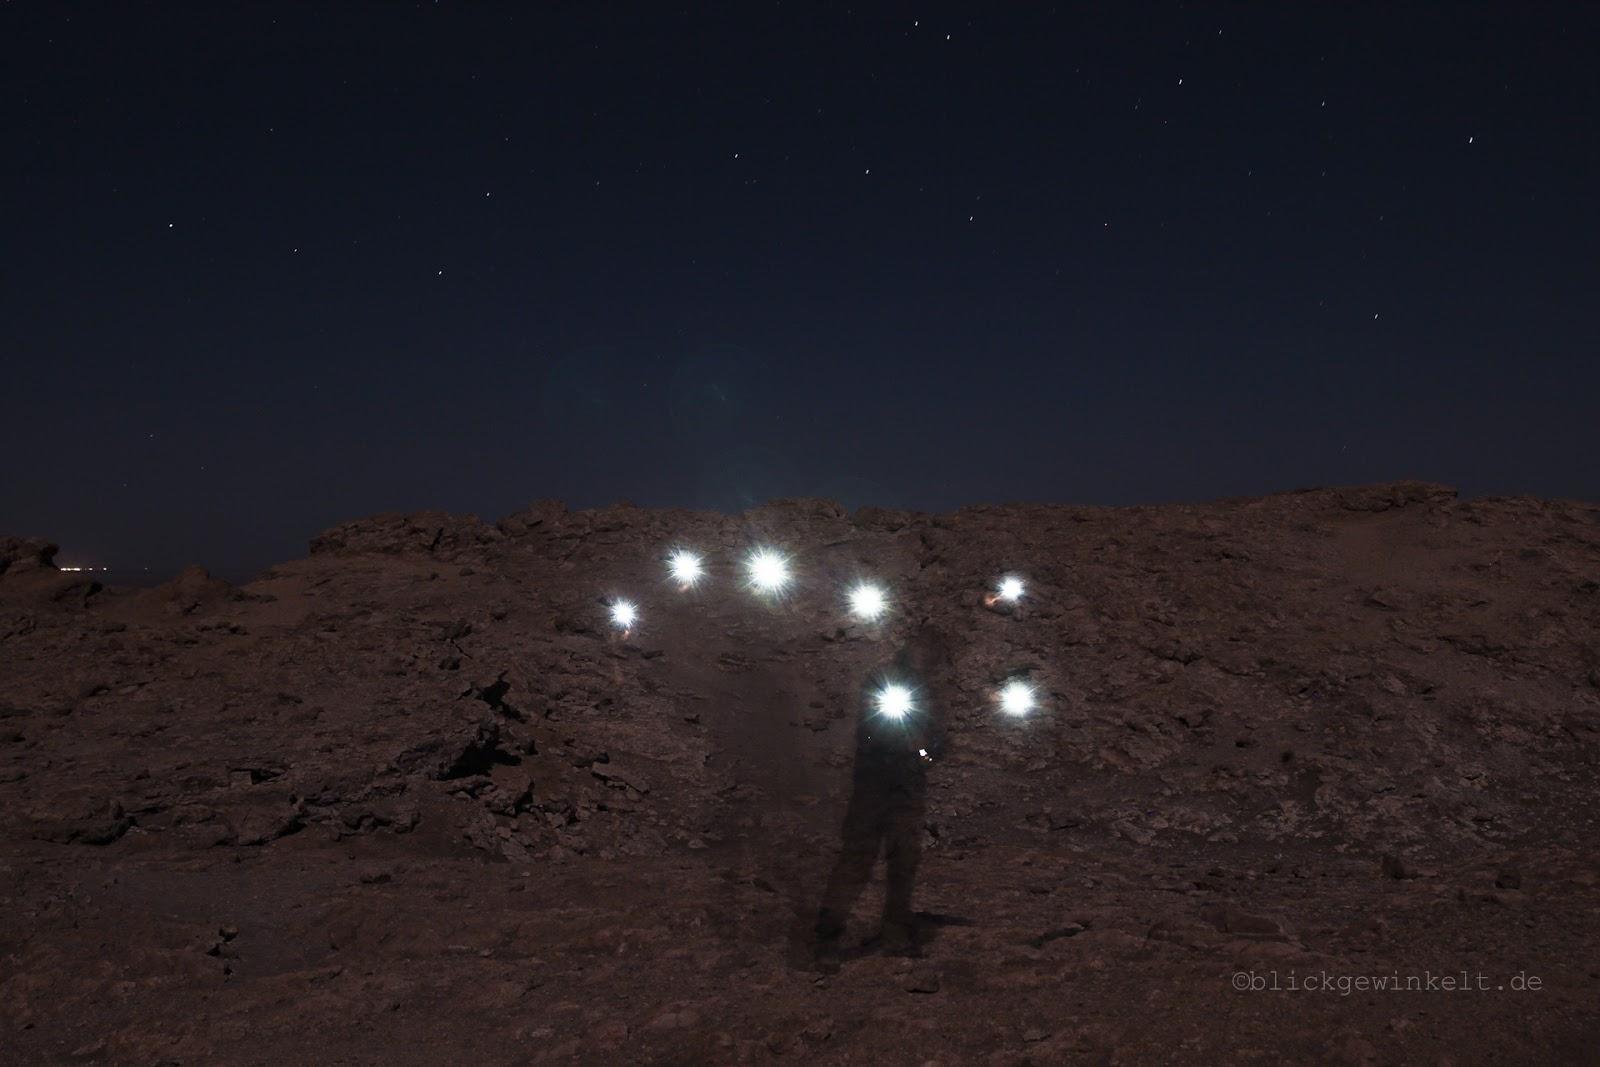 Lightpainting, Lichtmalerei Großer Wagen